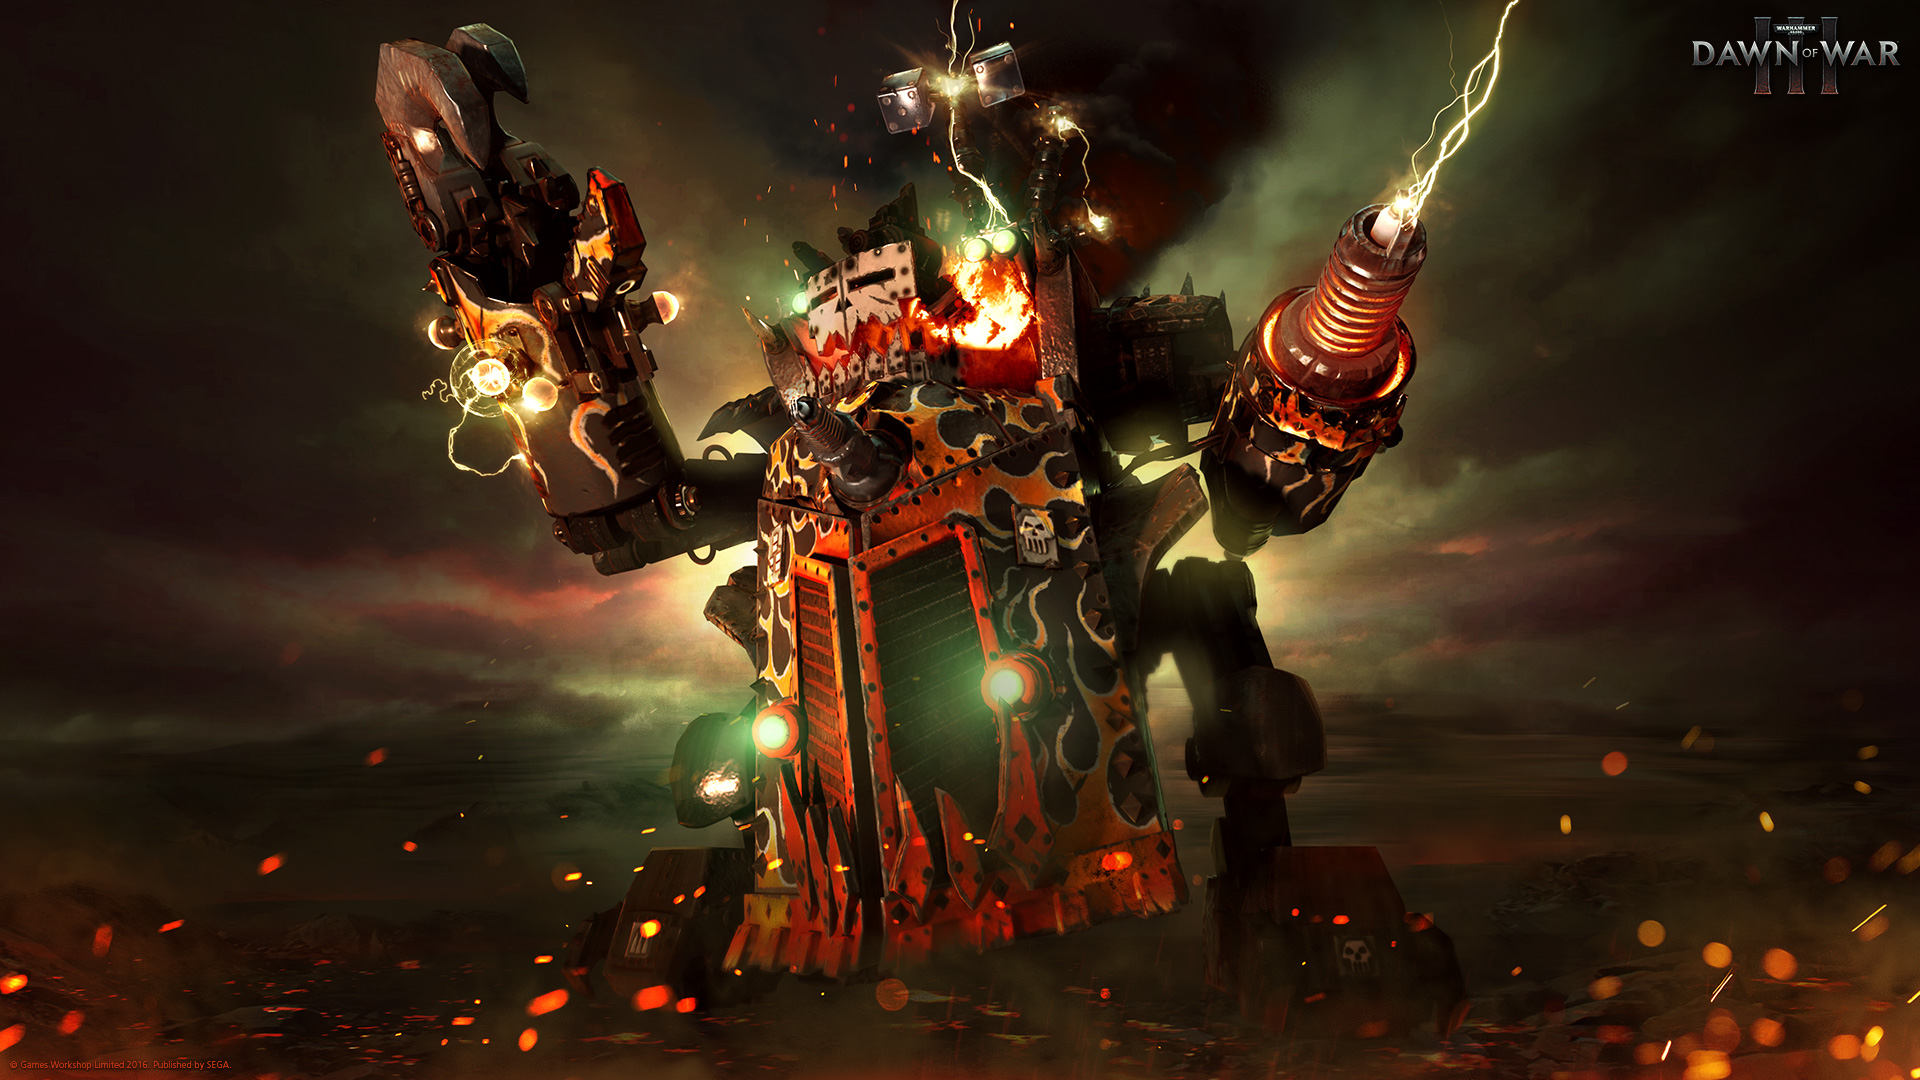 Gorkanaut Ork walker in Dawn of War 3